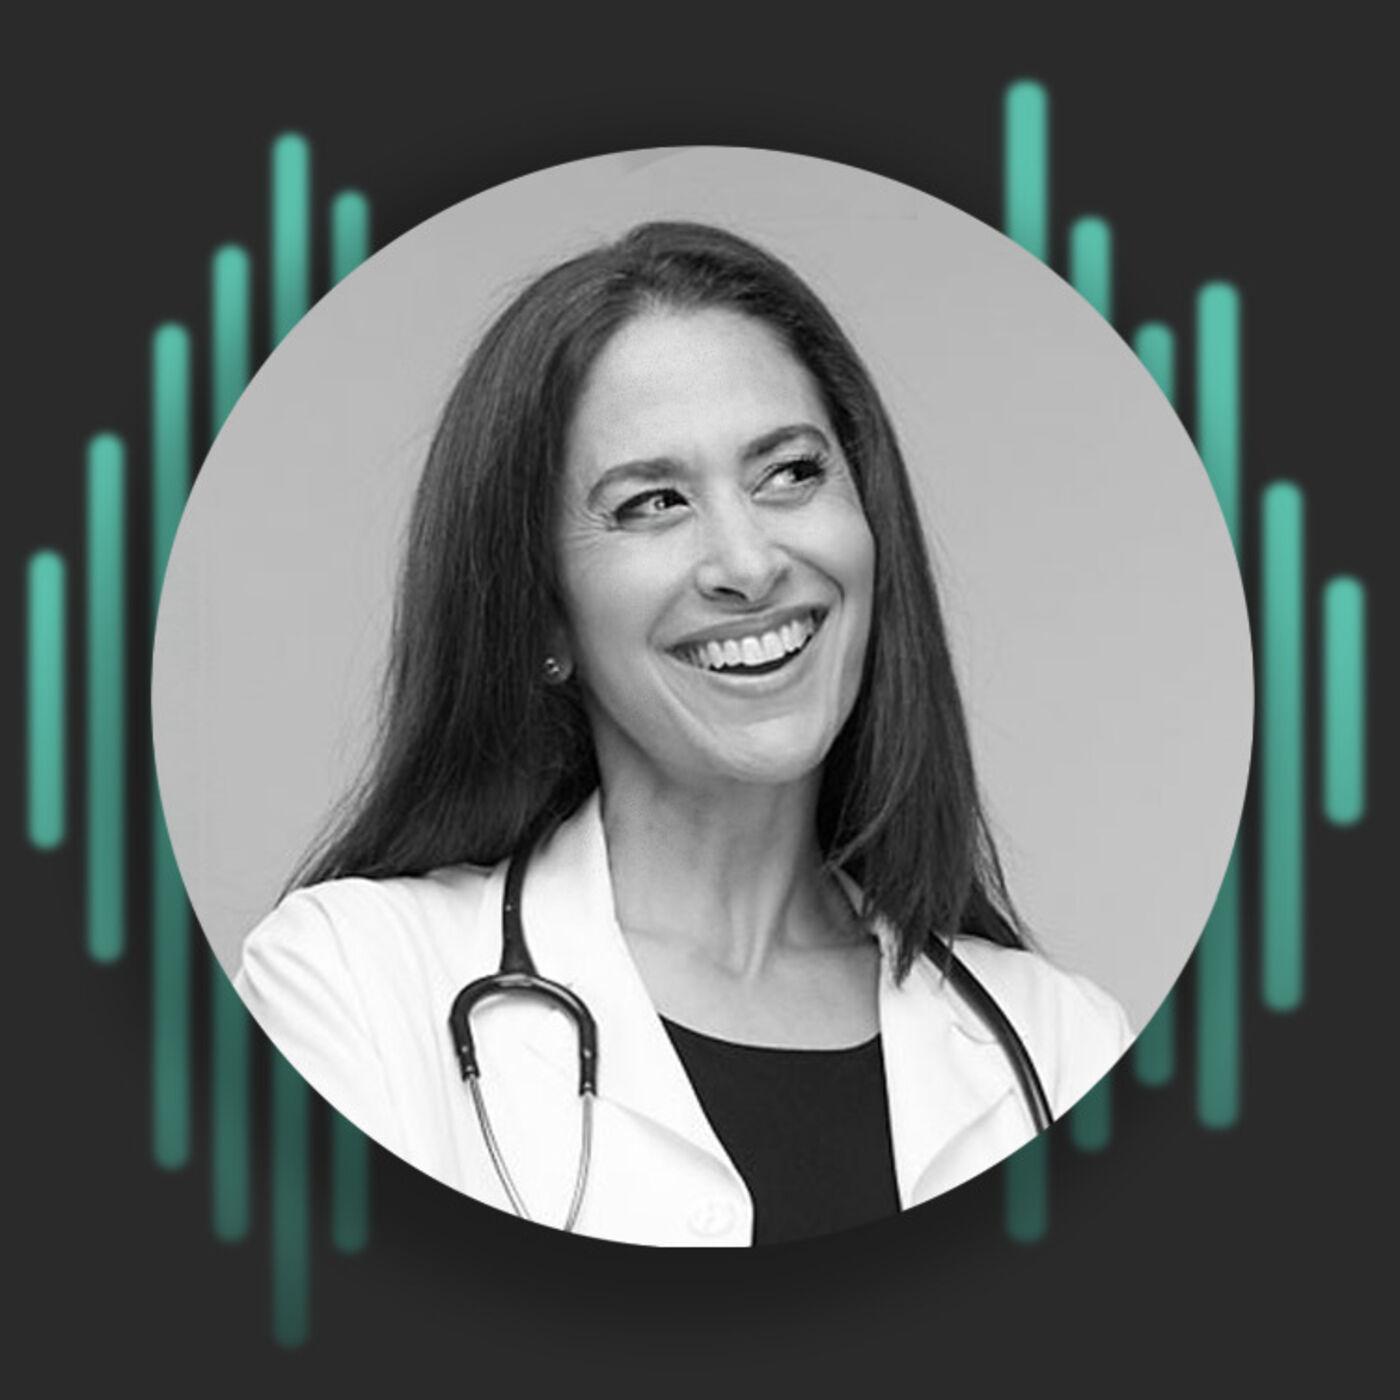 Episode 3: Adena Leder D.O. Neurologist